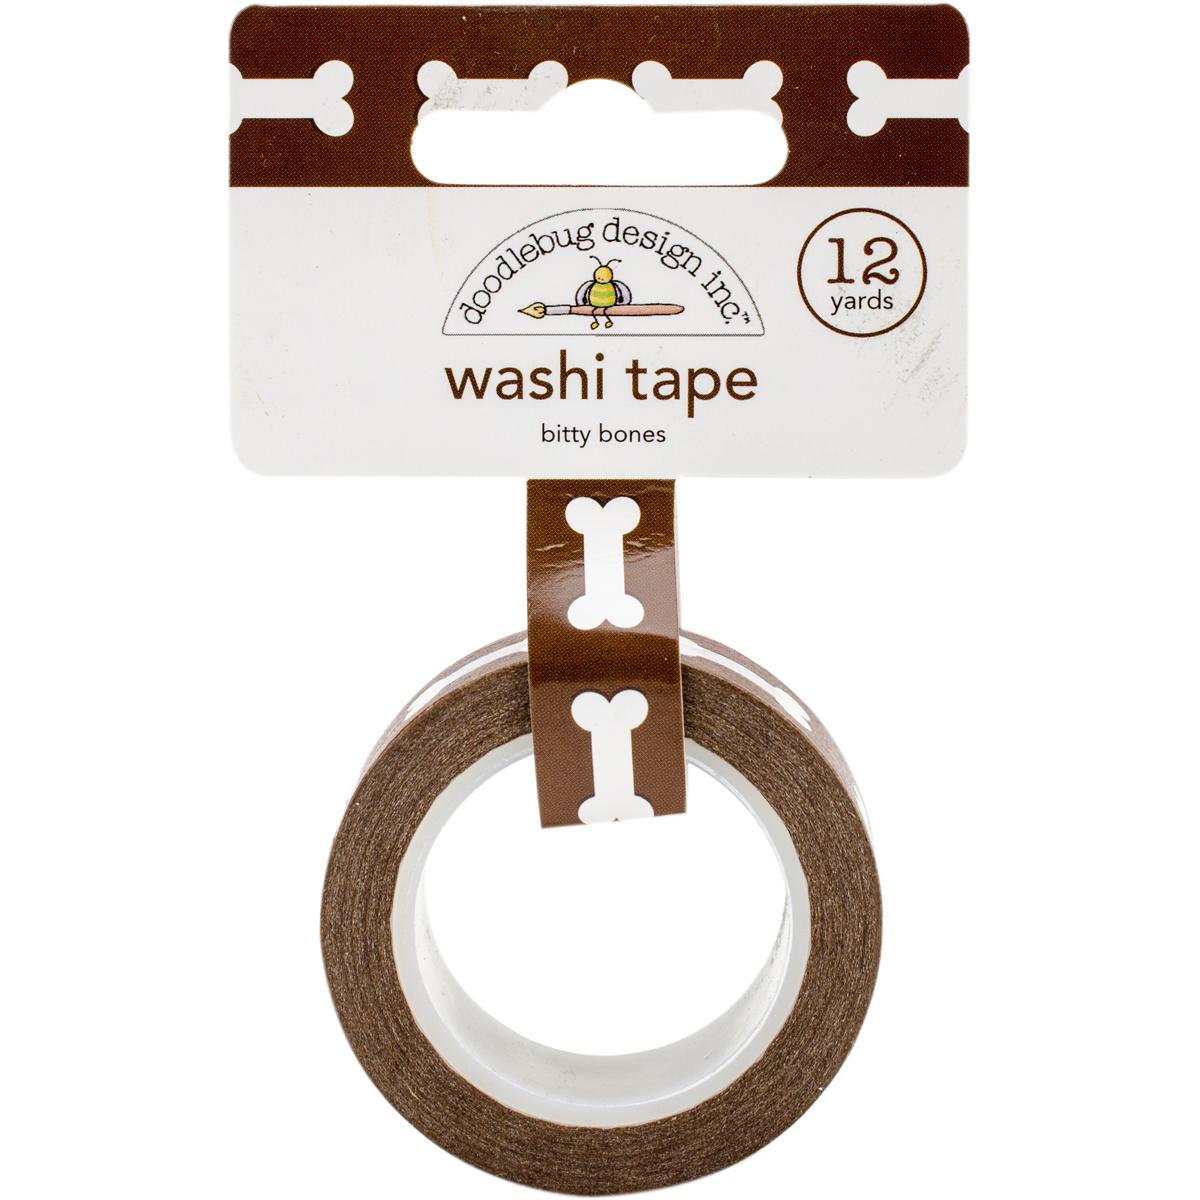 Doodlebug Washi Tape 15mmX12yd-Bitty Bones